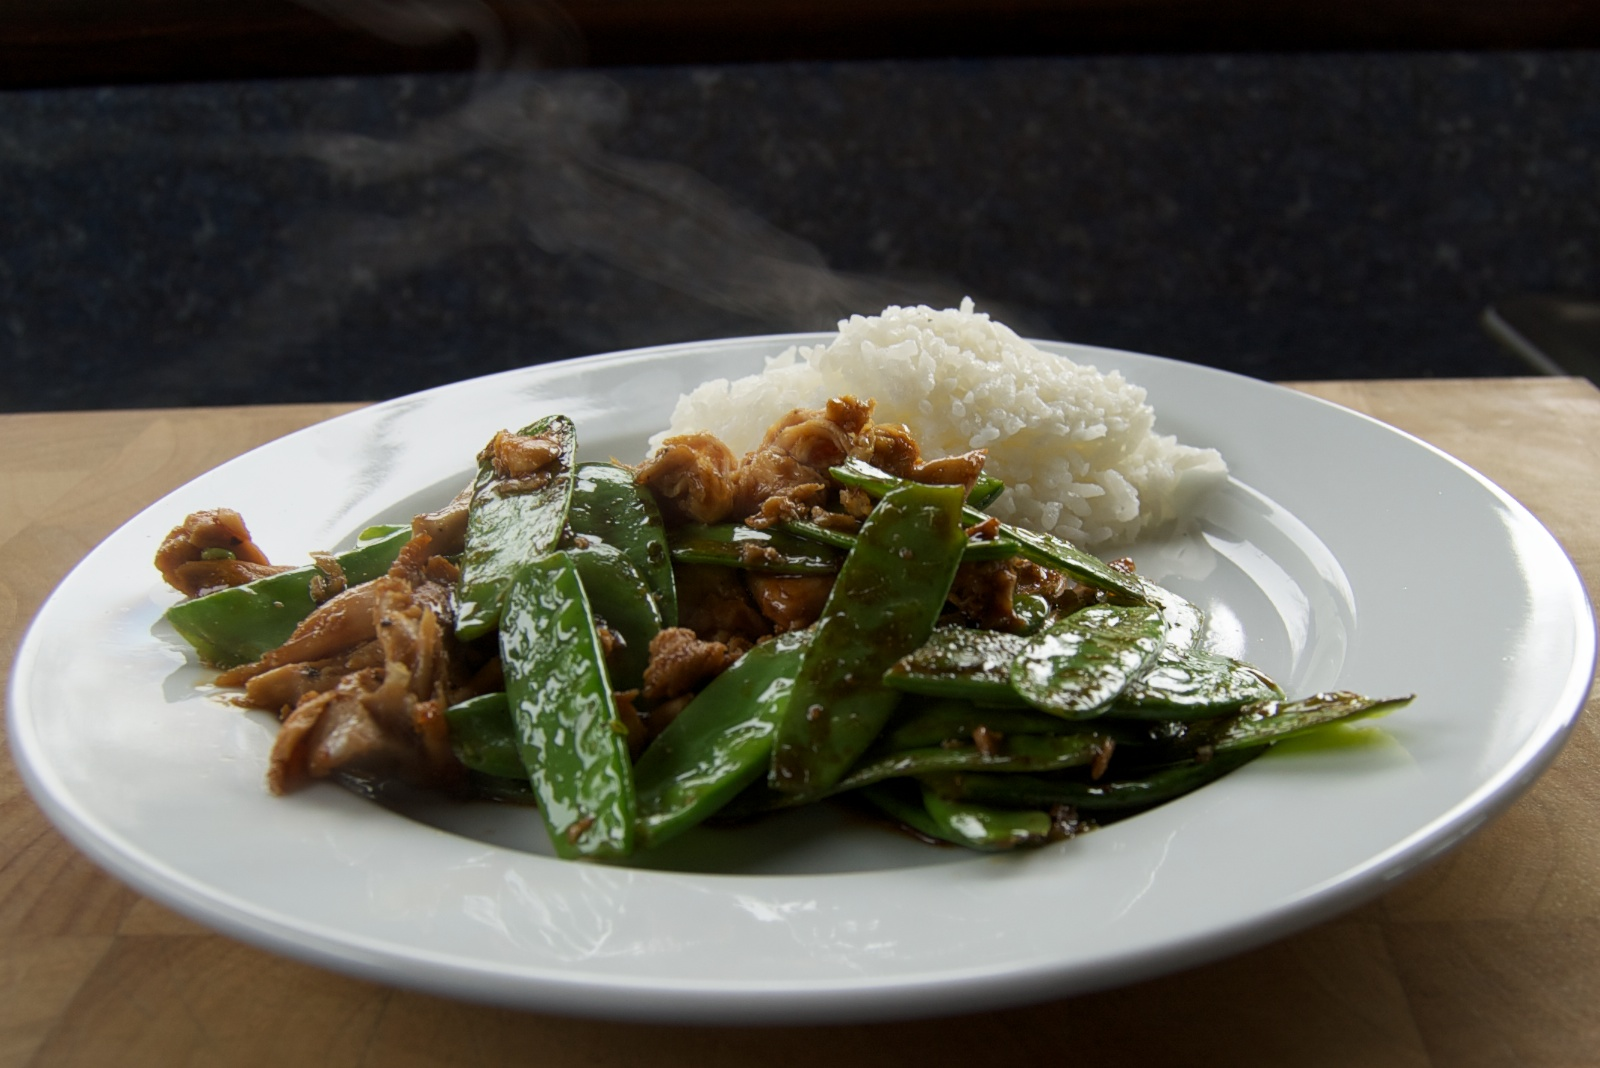 http://blog.rickk.com/food/2012/04/18/ate.2012.04.18.l.jpg